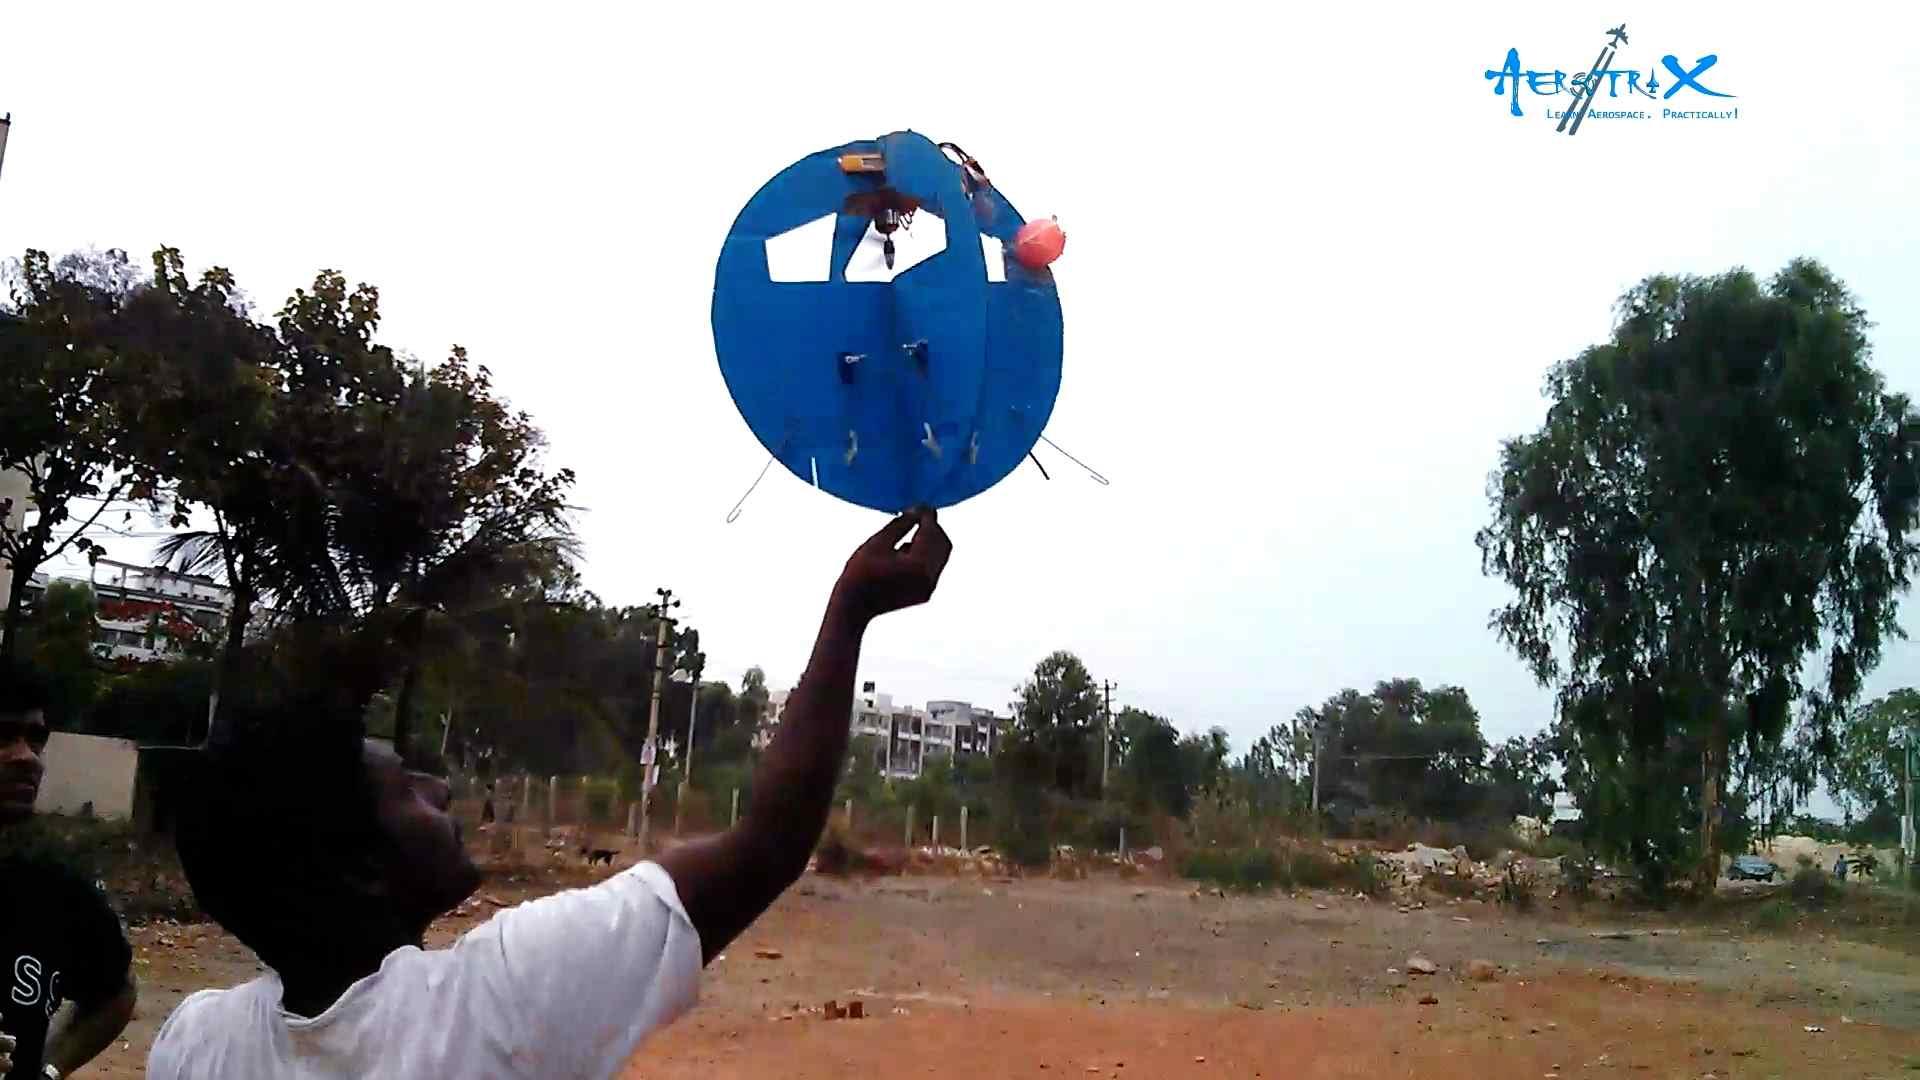 Sphere Drone Flight Session